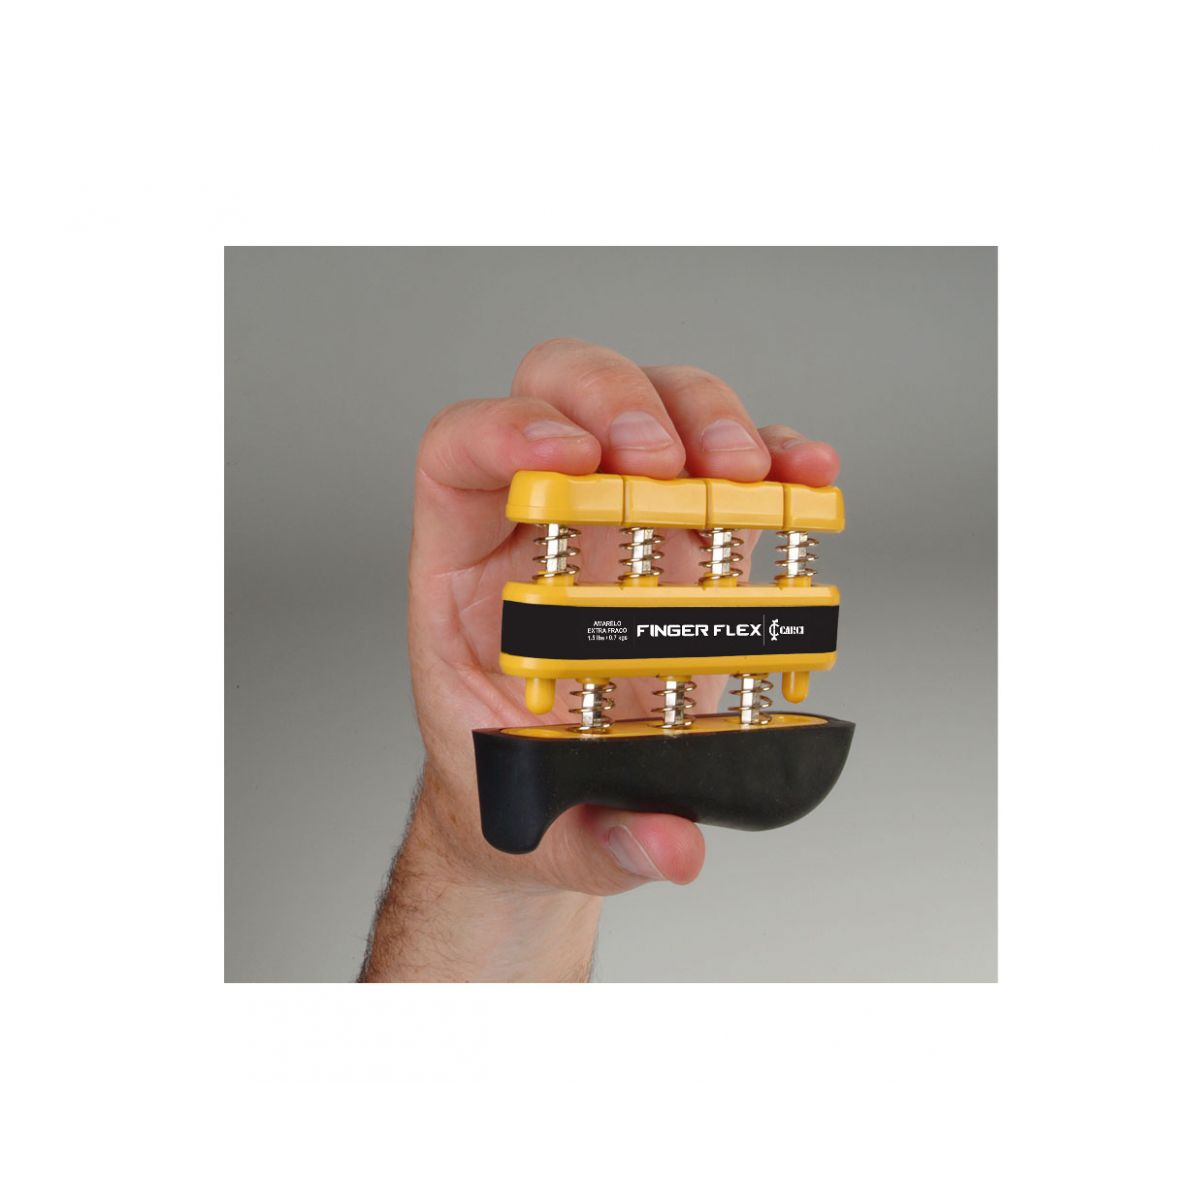 Finger Flex Amarelo: 1.5 lbs - 0,7 kg